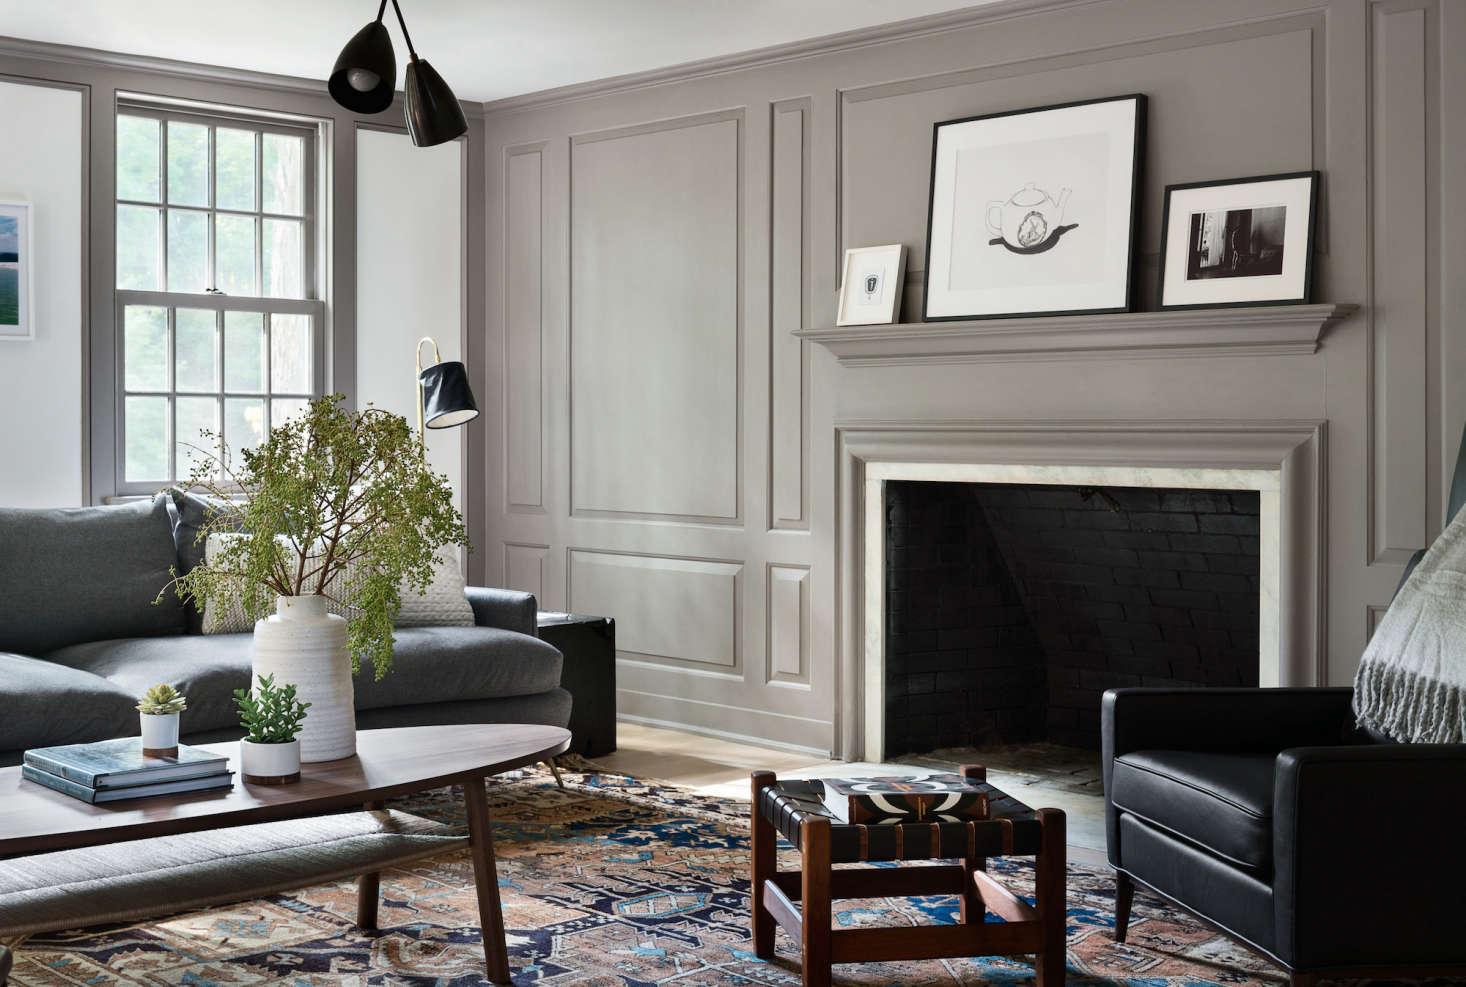 modern-farmhouse-renovation-with-warm-gray-millwork-walls-fireplace